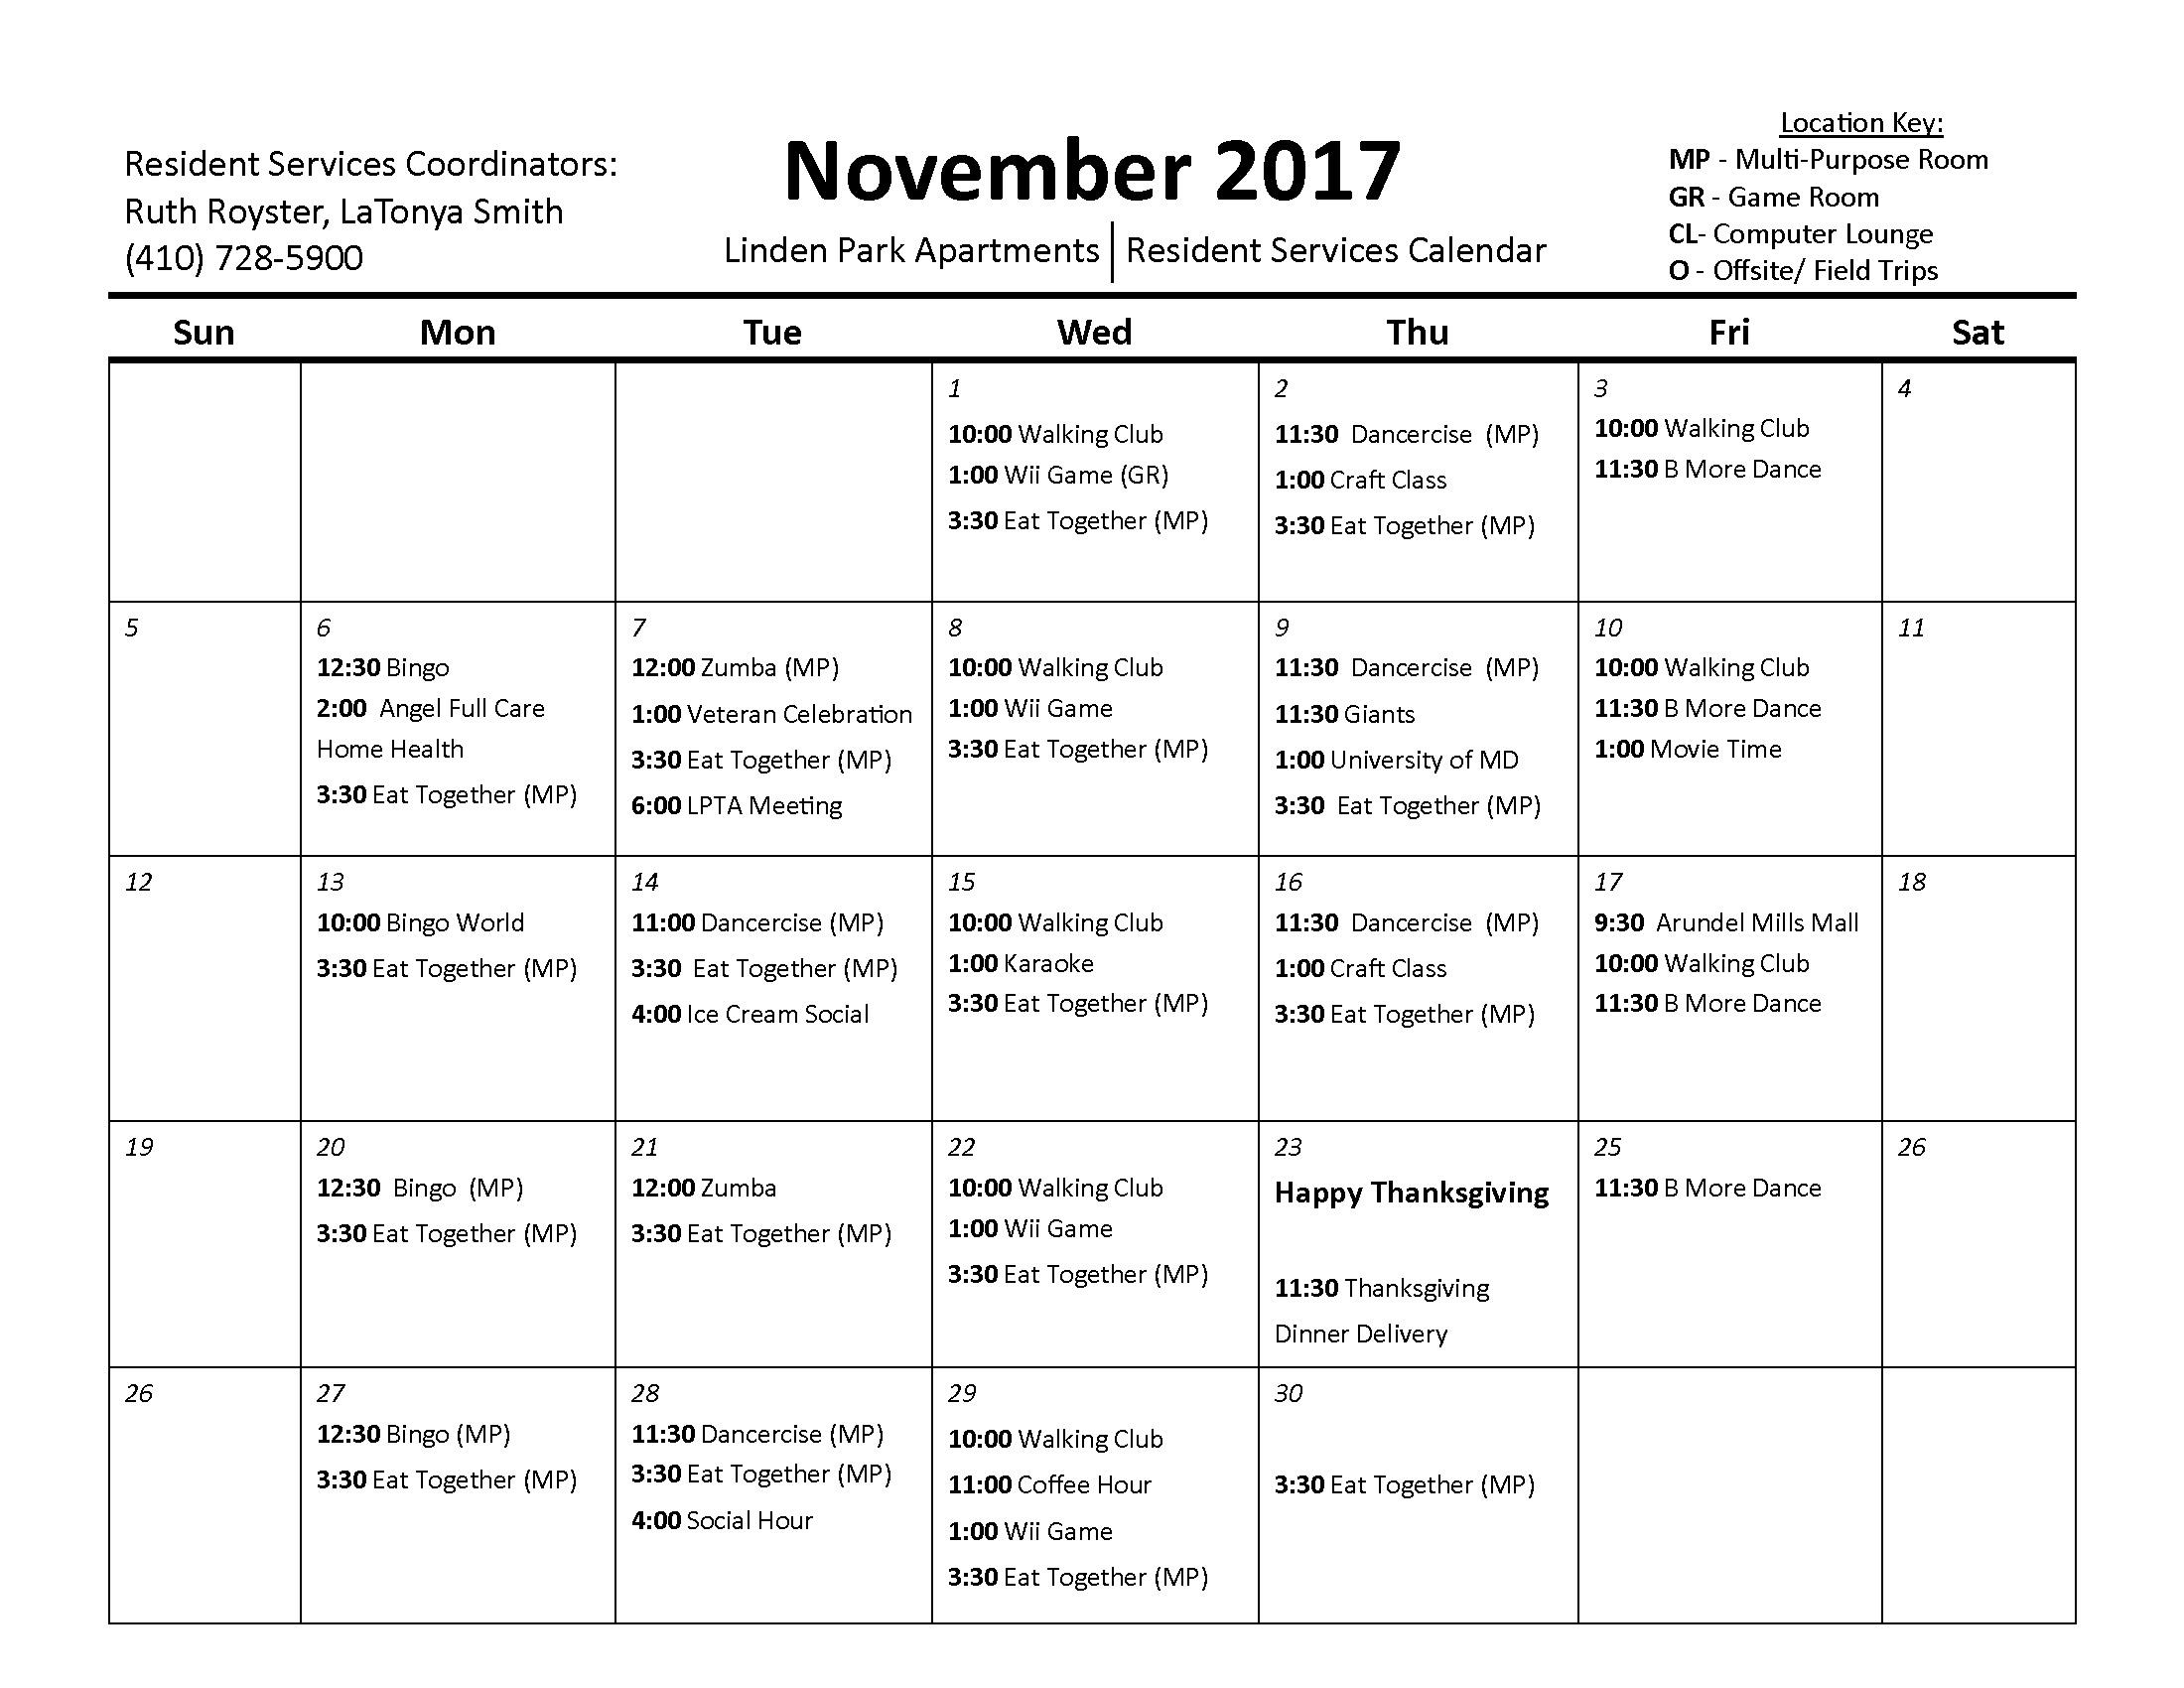 Linden Park Apartments November 2017 Calendar Page 1